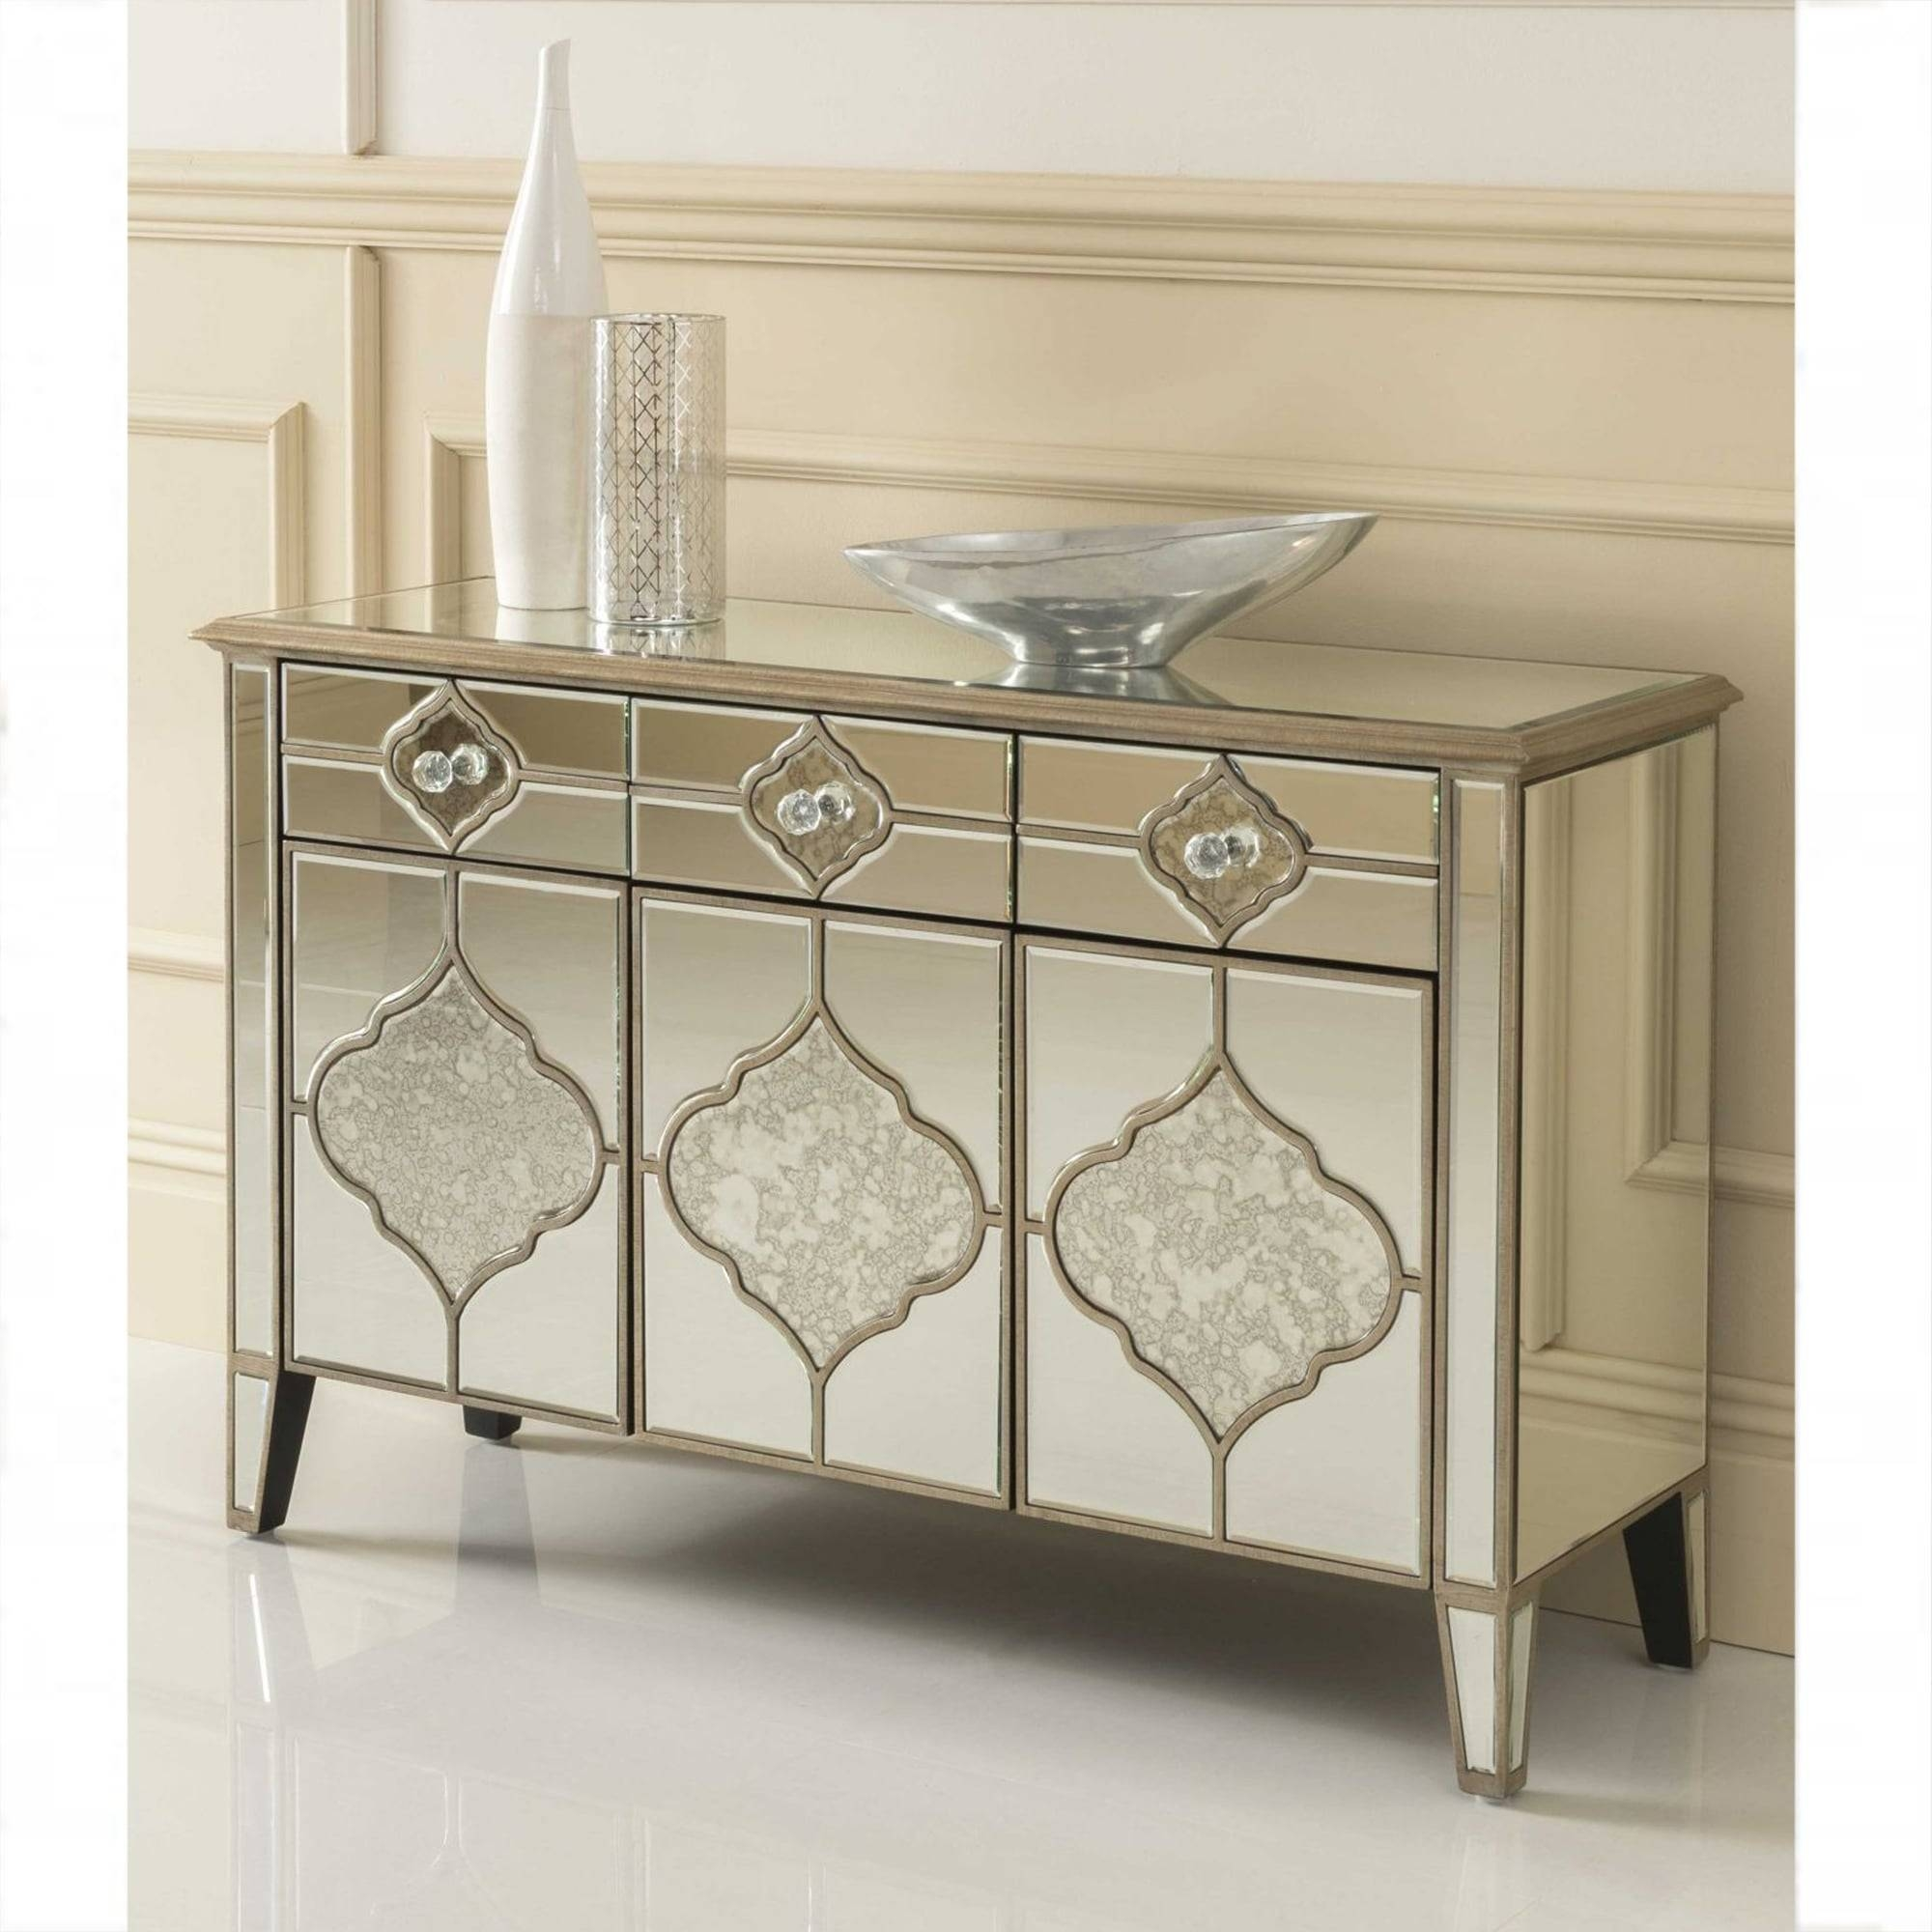 Sassari Mirrored Sideboard | Venetian Glass Furniture For Sideboard Mirror (View 5 of 20)